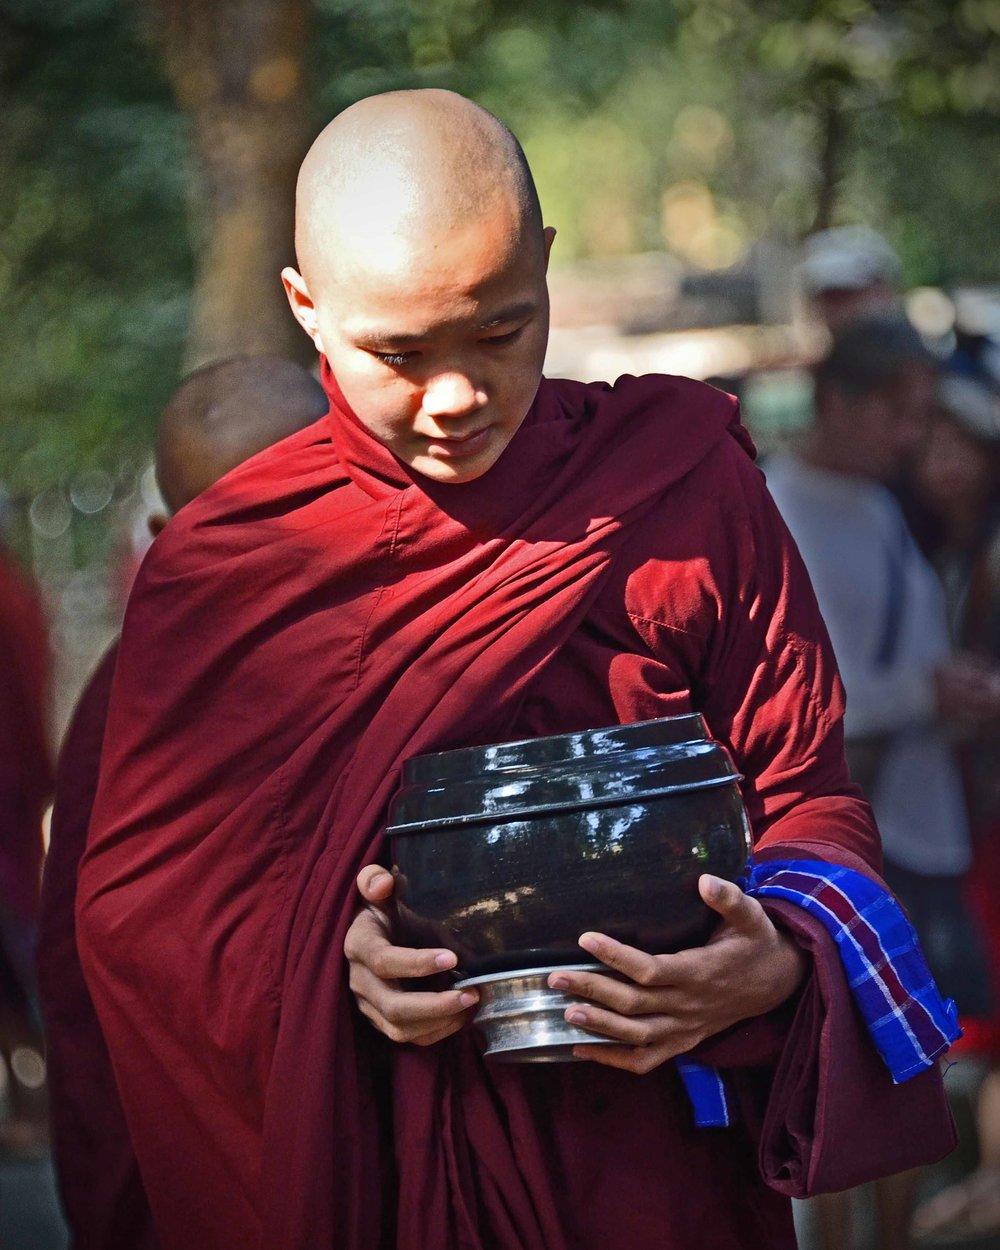 Monk on alms round, Mahagandayon Buddhist Monastary